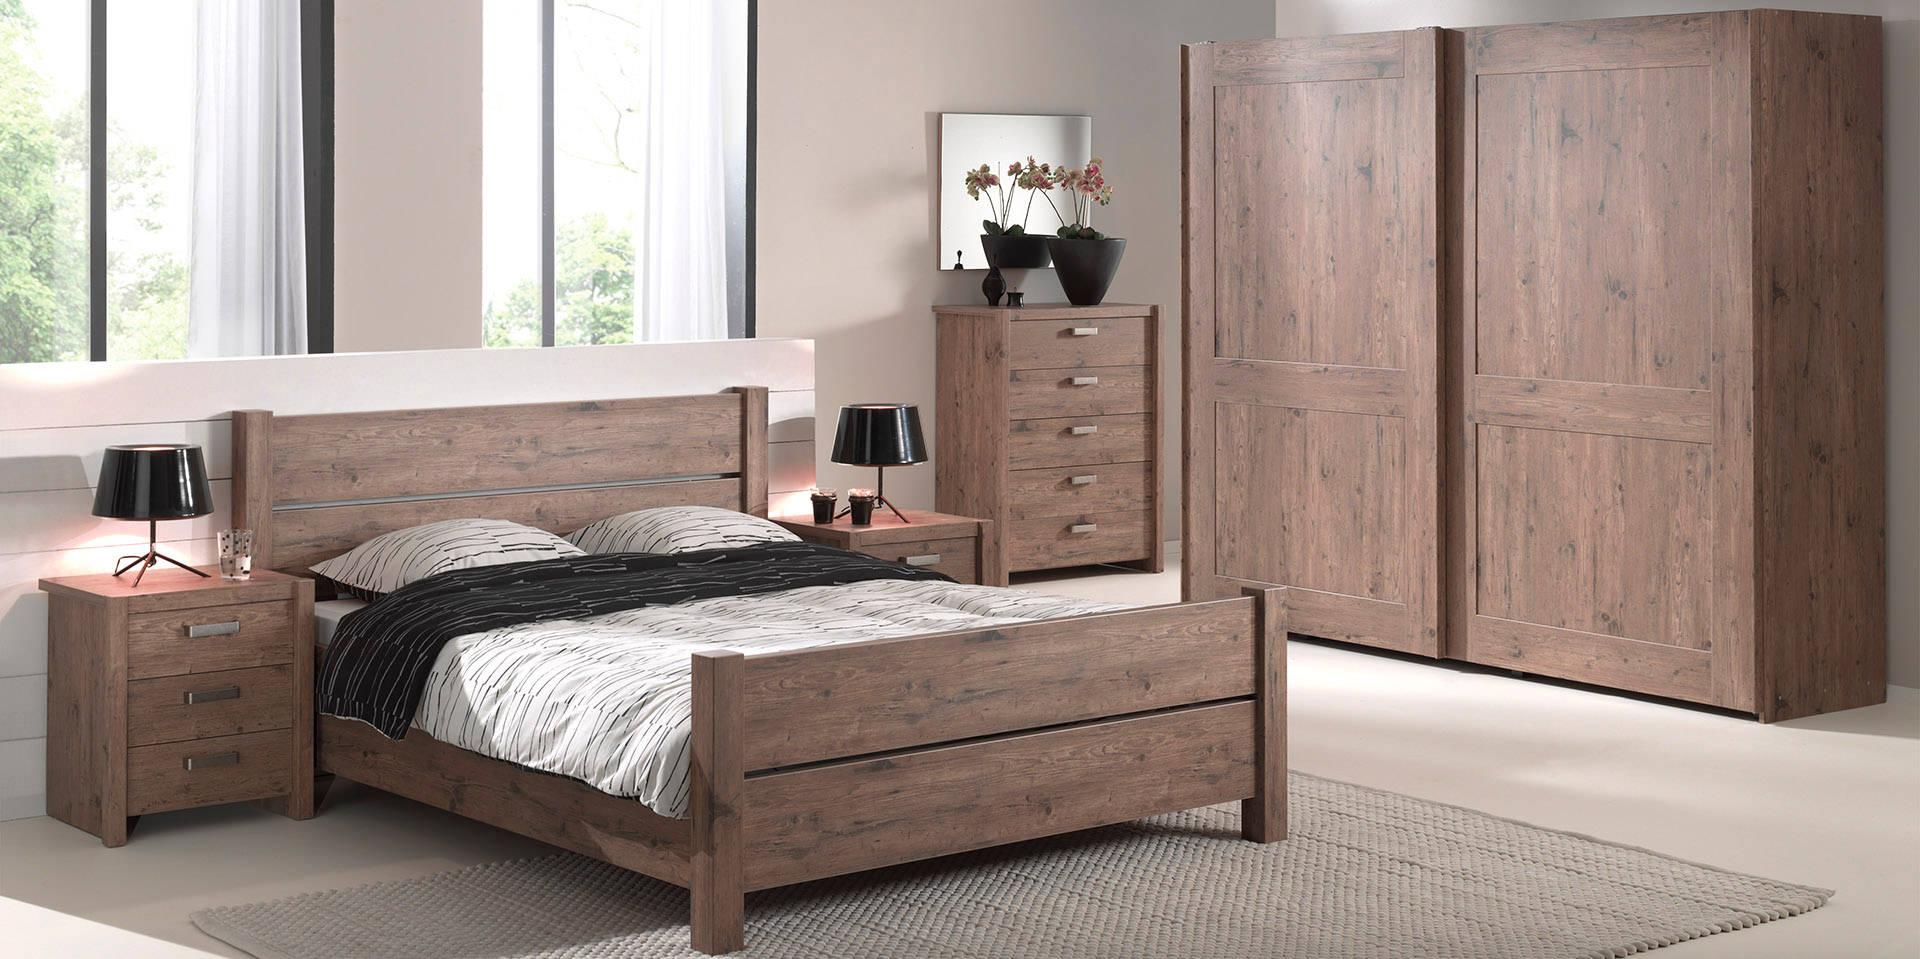 Iliana Pine Bedroom Pic2